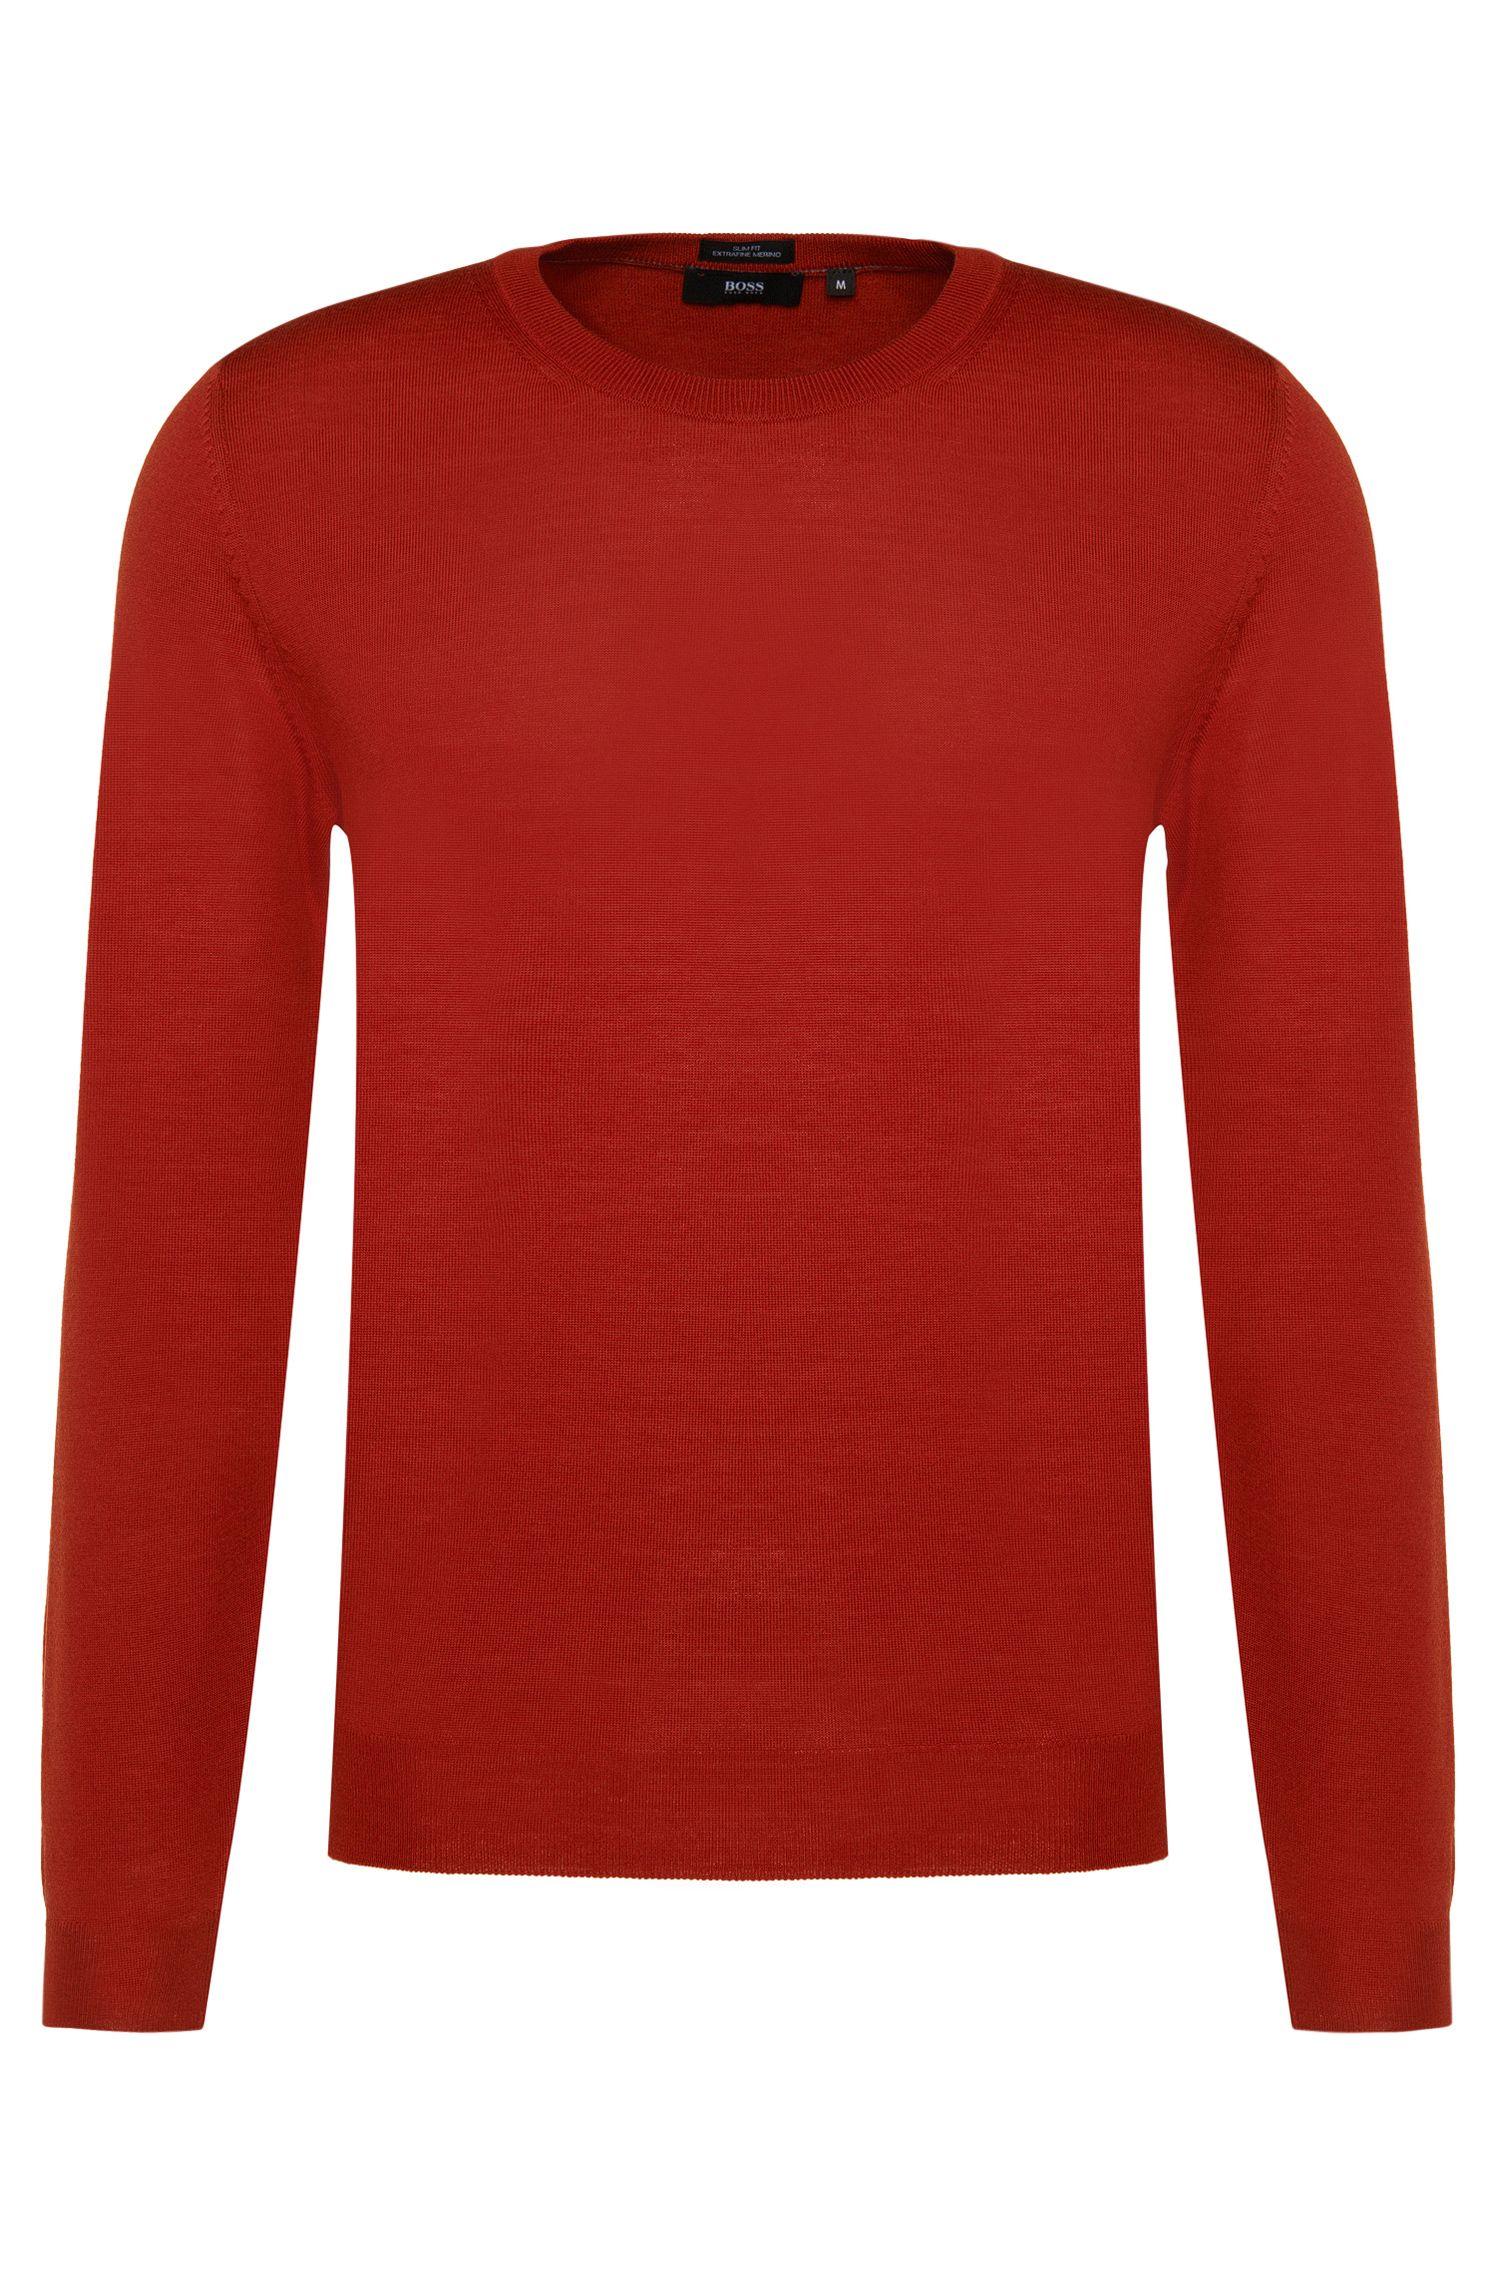 'Leno-F' | Virgin Wool Sweater